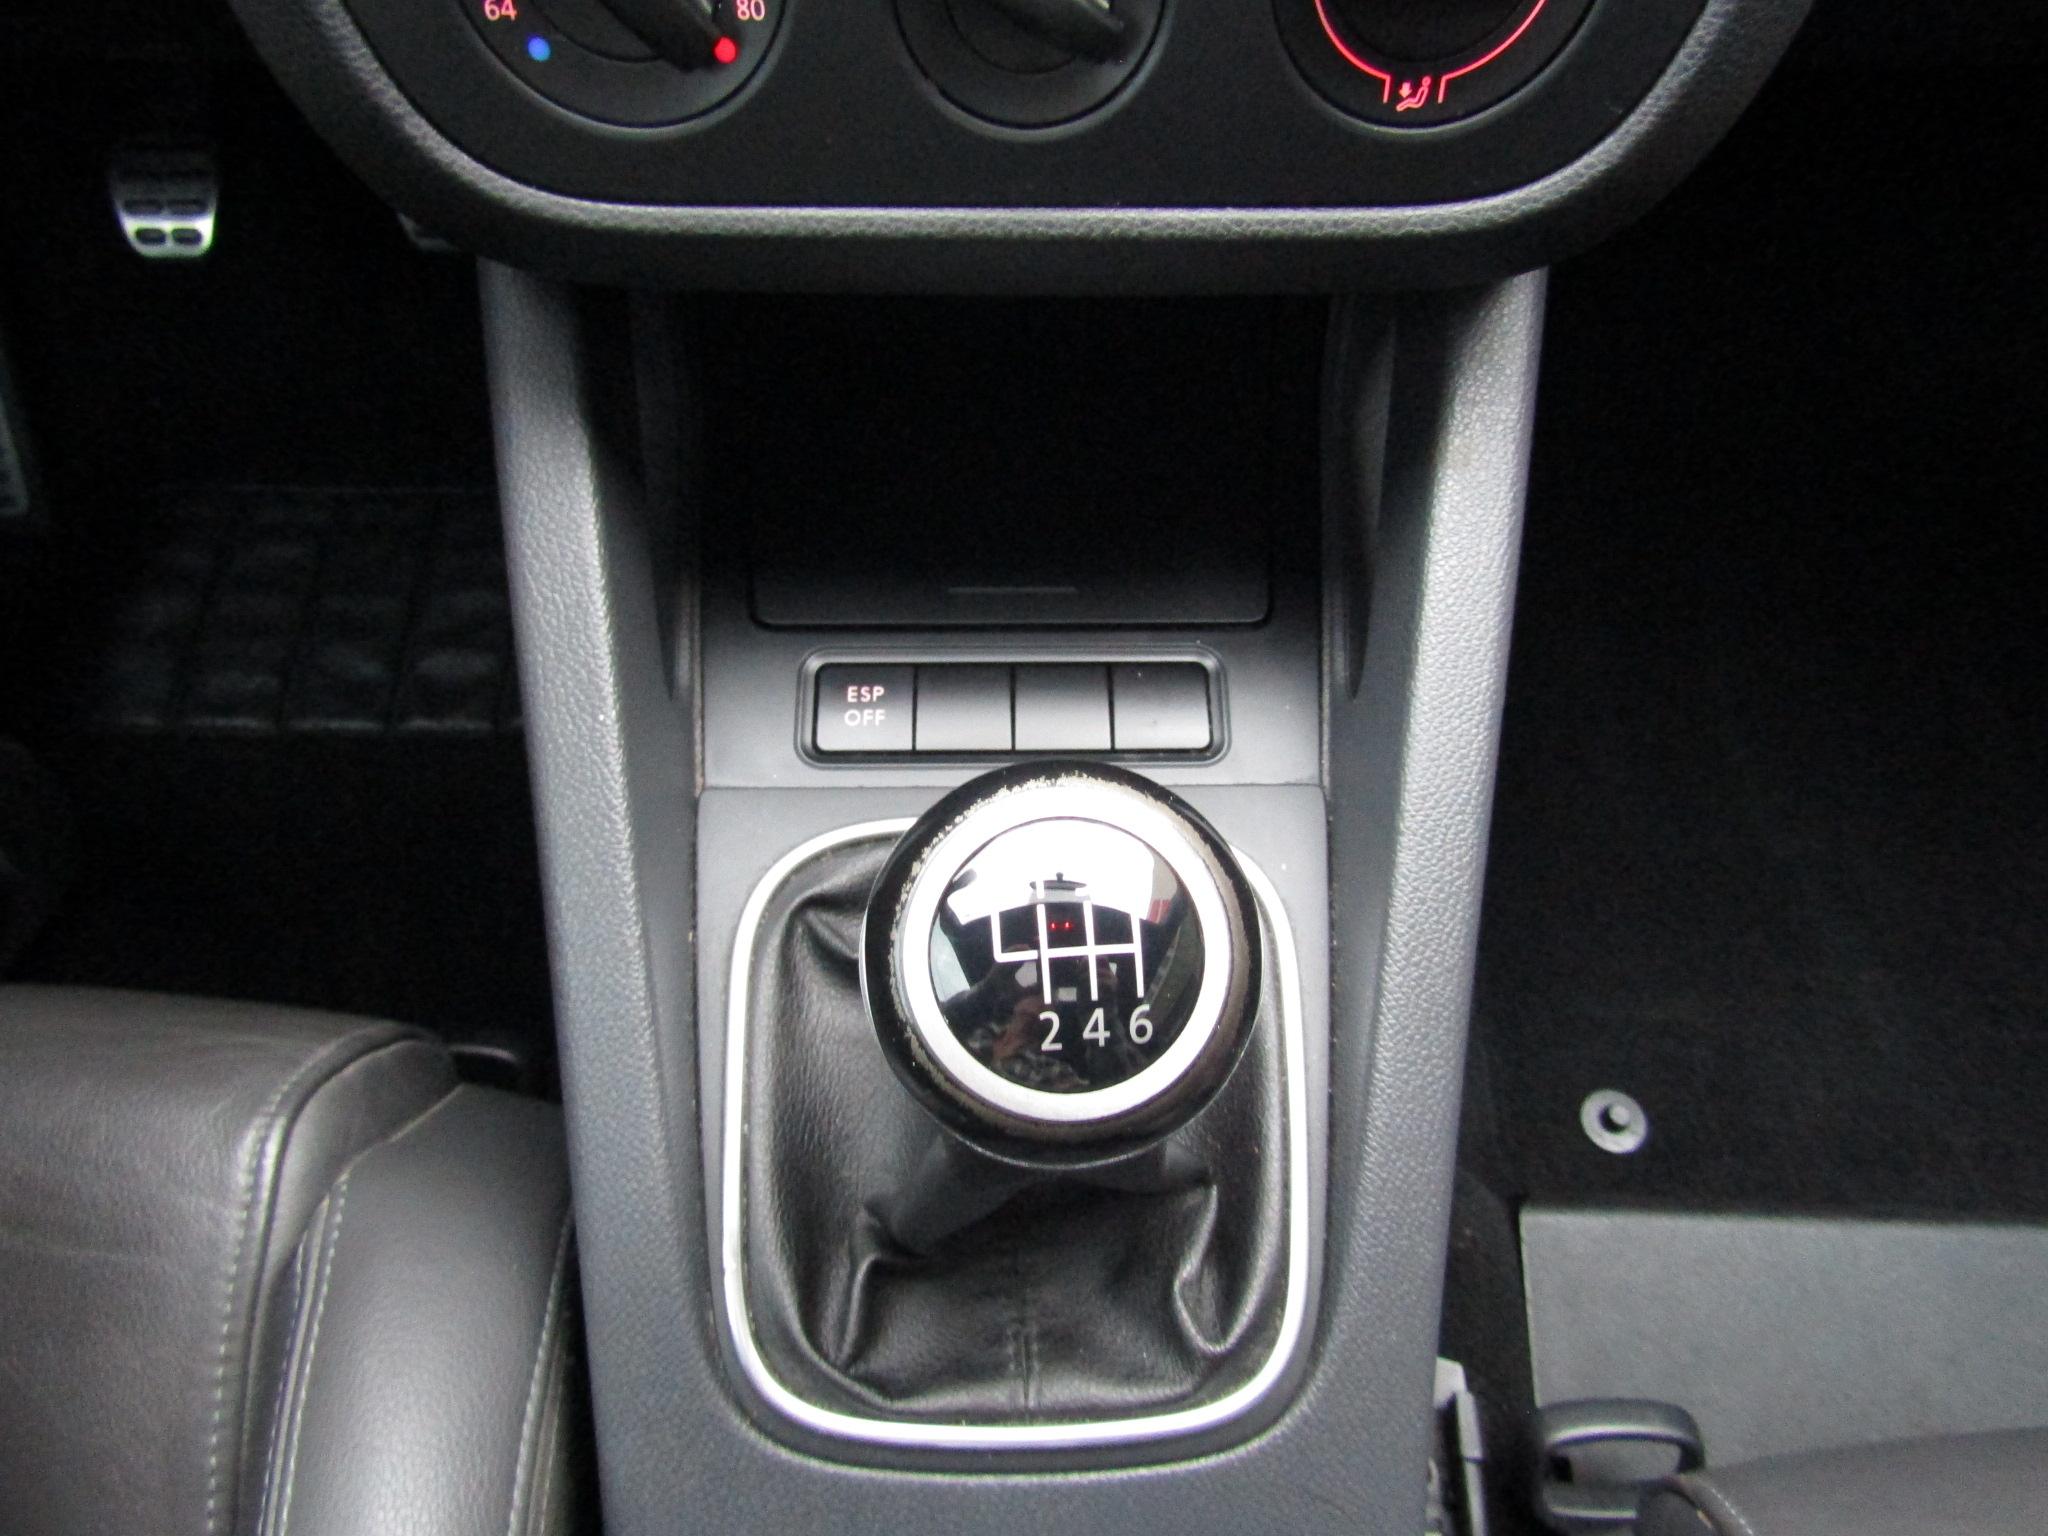 VW GTI 2008 6 Speed Manual 2 Door